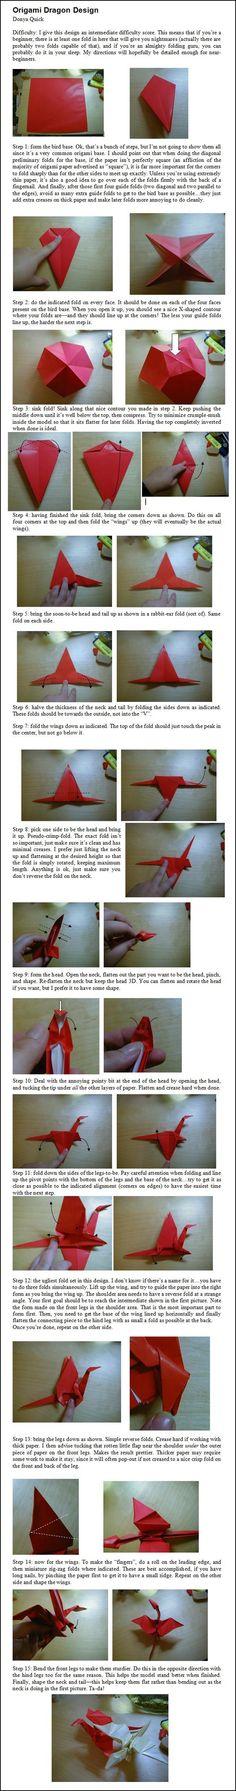 Origami Dragon Design Folding Instructions | Origami Instruction